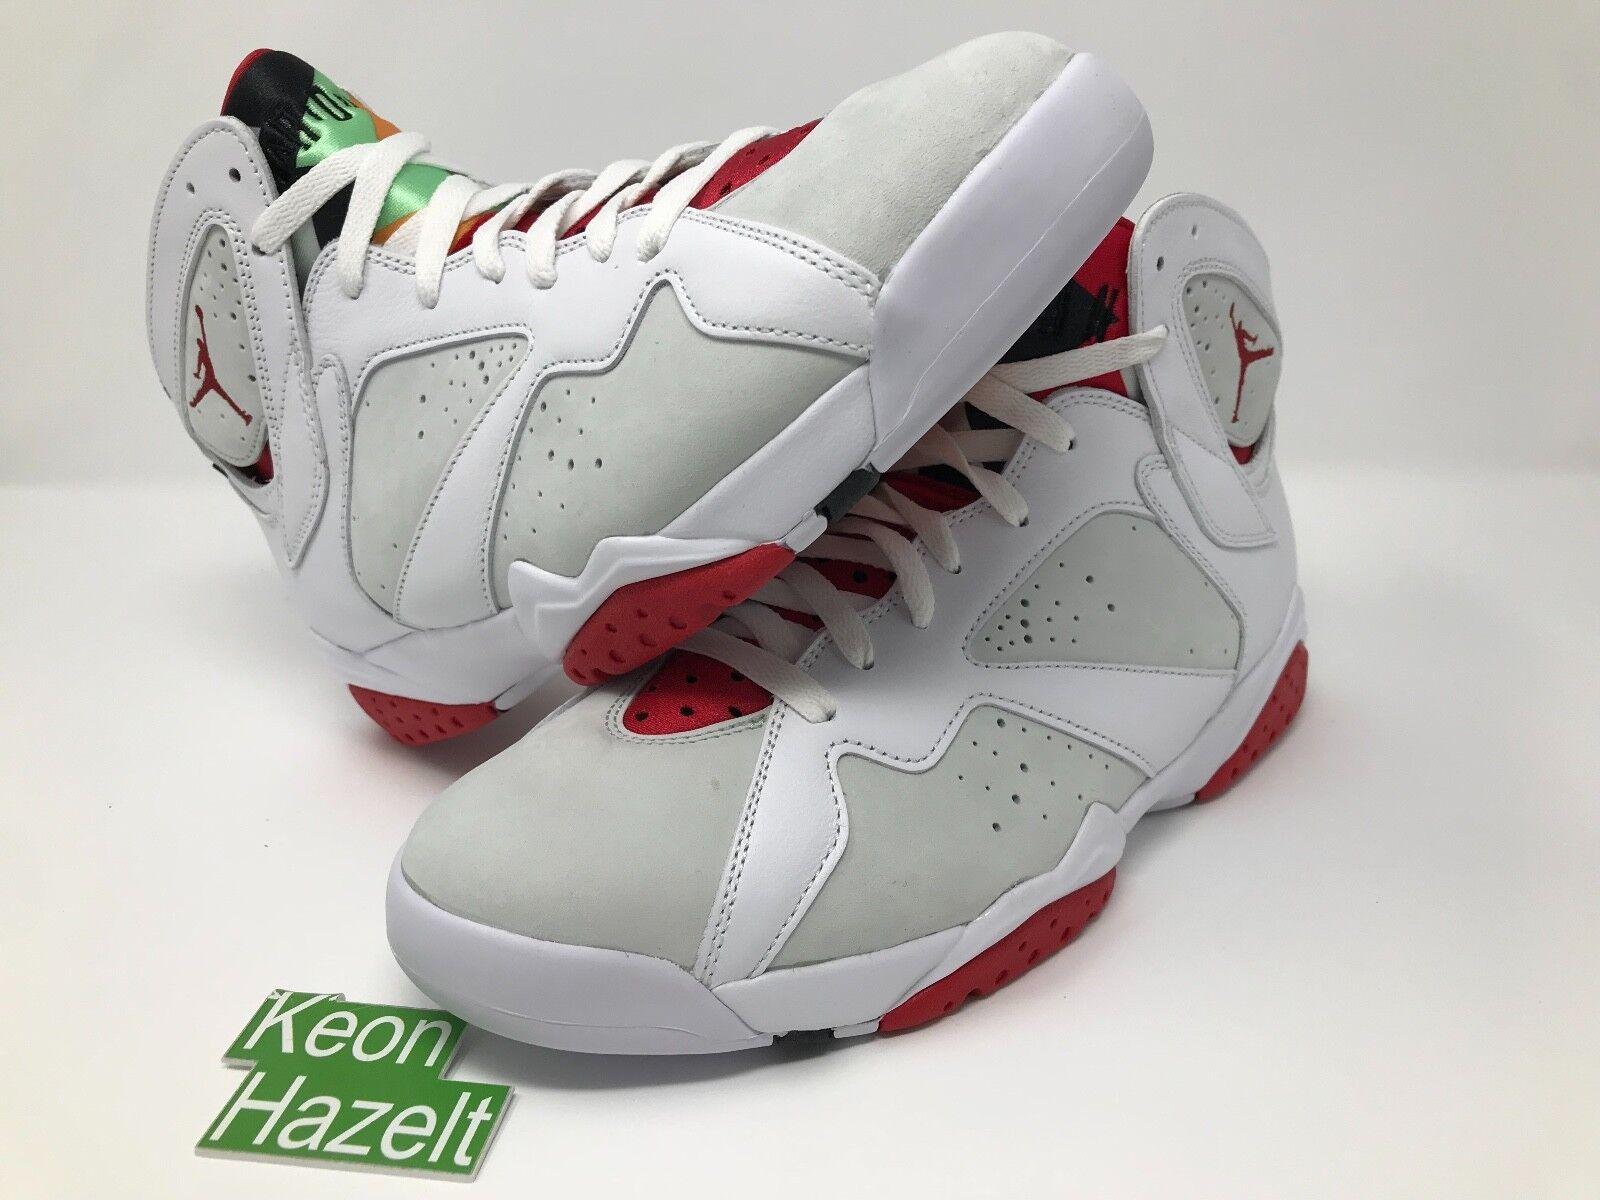 finest selection 6a2c4 95051 Nike Air Jordan Jordan Jordan 7 VII Retro Hare Bordeaux Raptor Flint  Concord Gamma Bred Sz